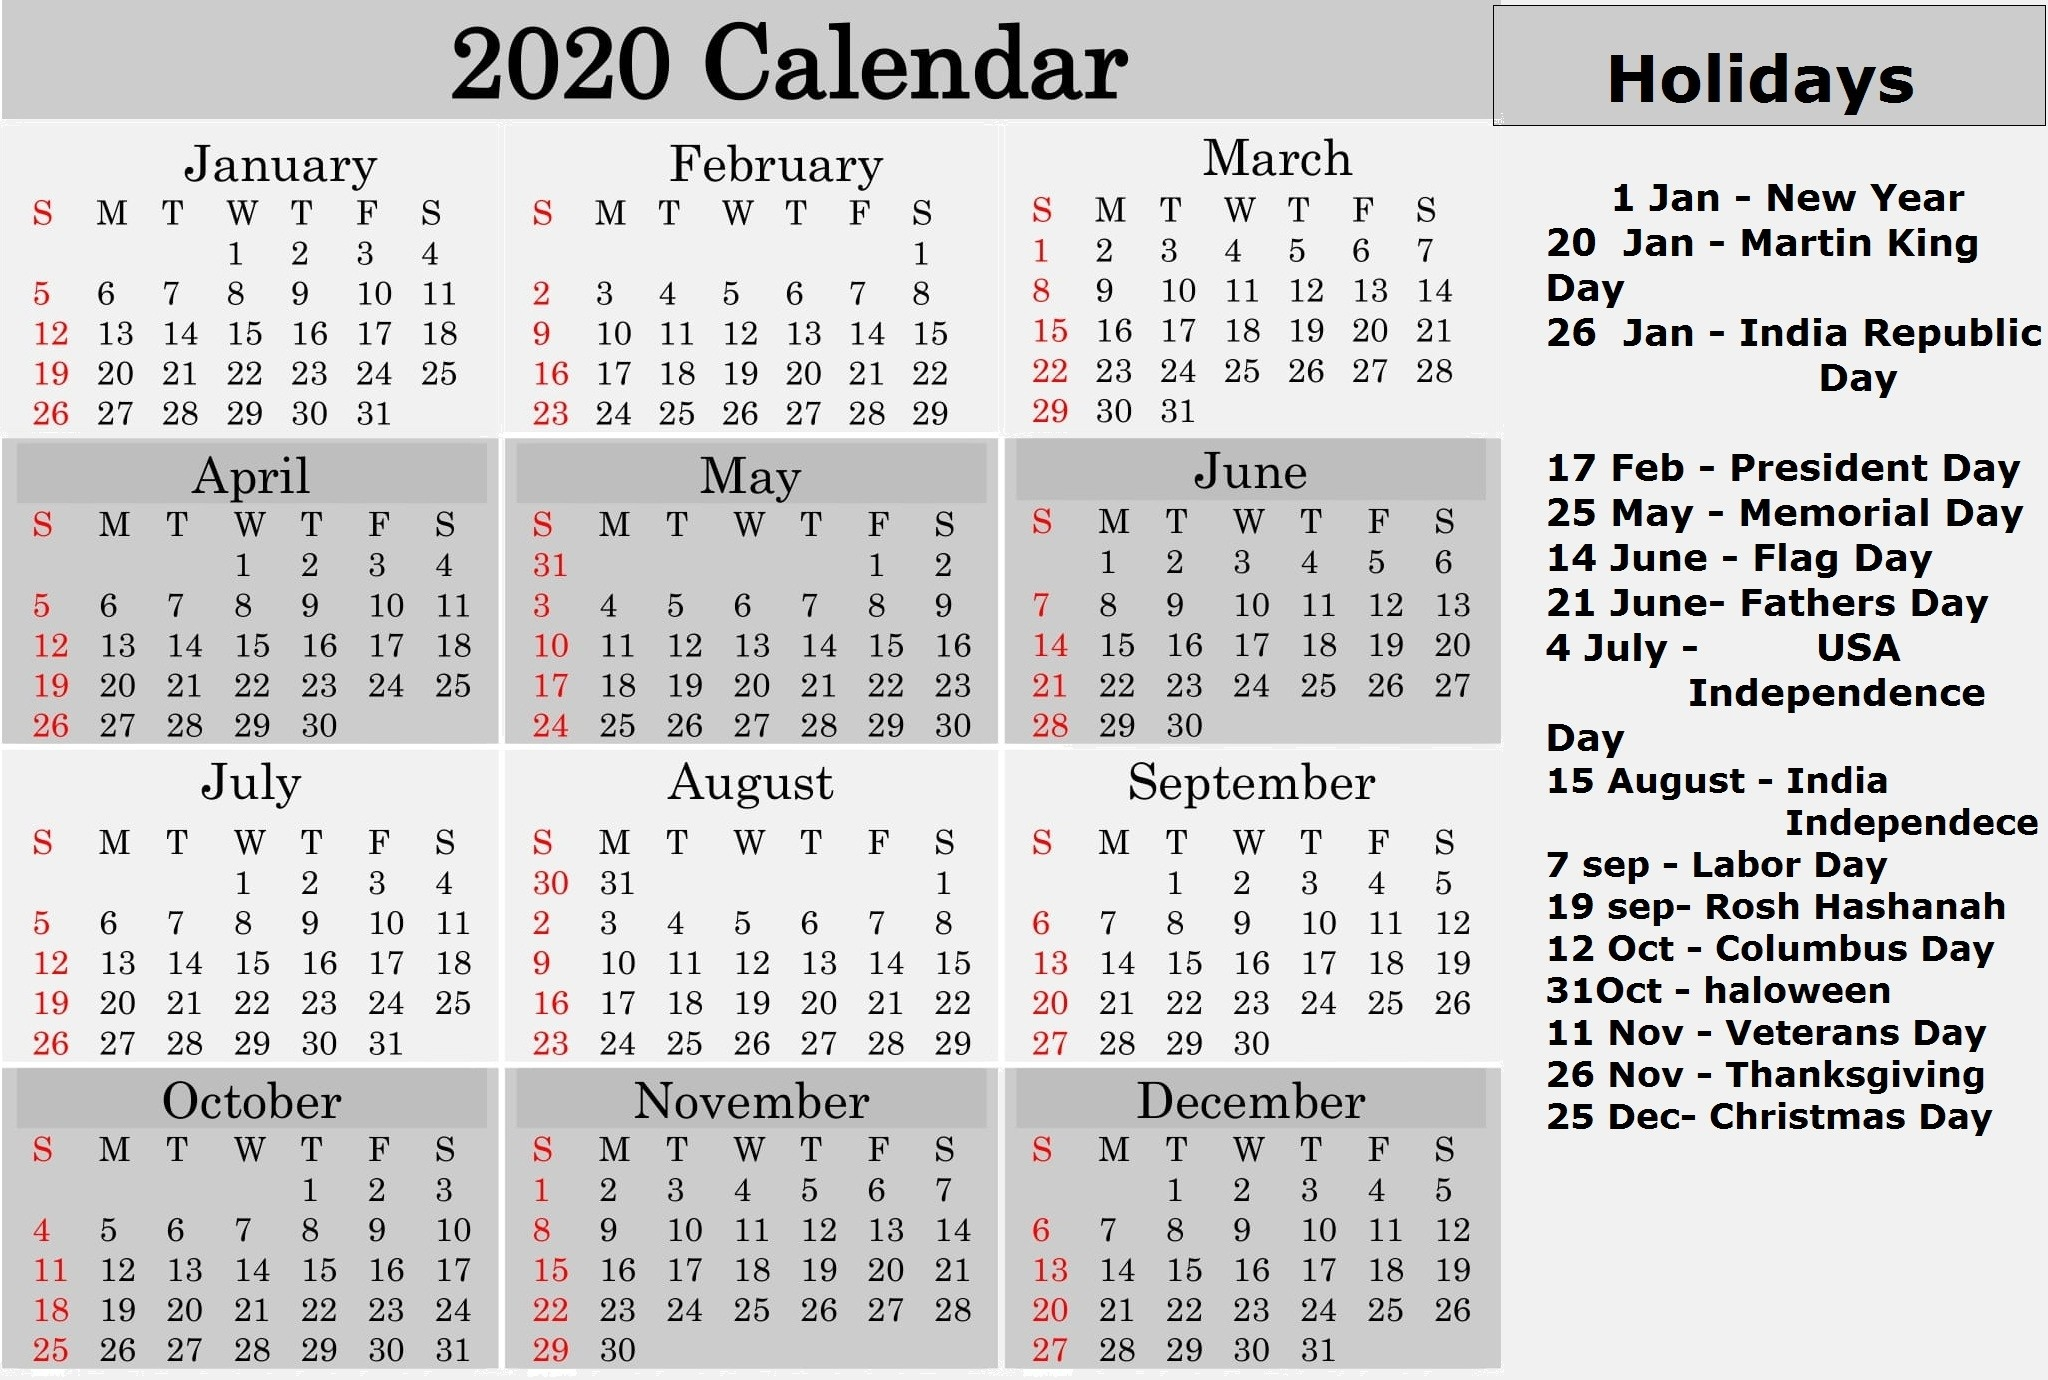 Printable 2020 Calendar With Federal Holidays – Free Latest-2020 List Of Holidays Printable